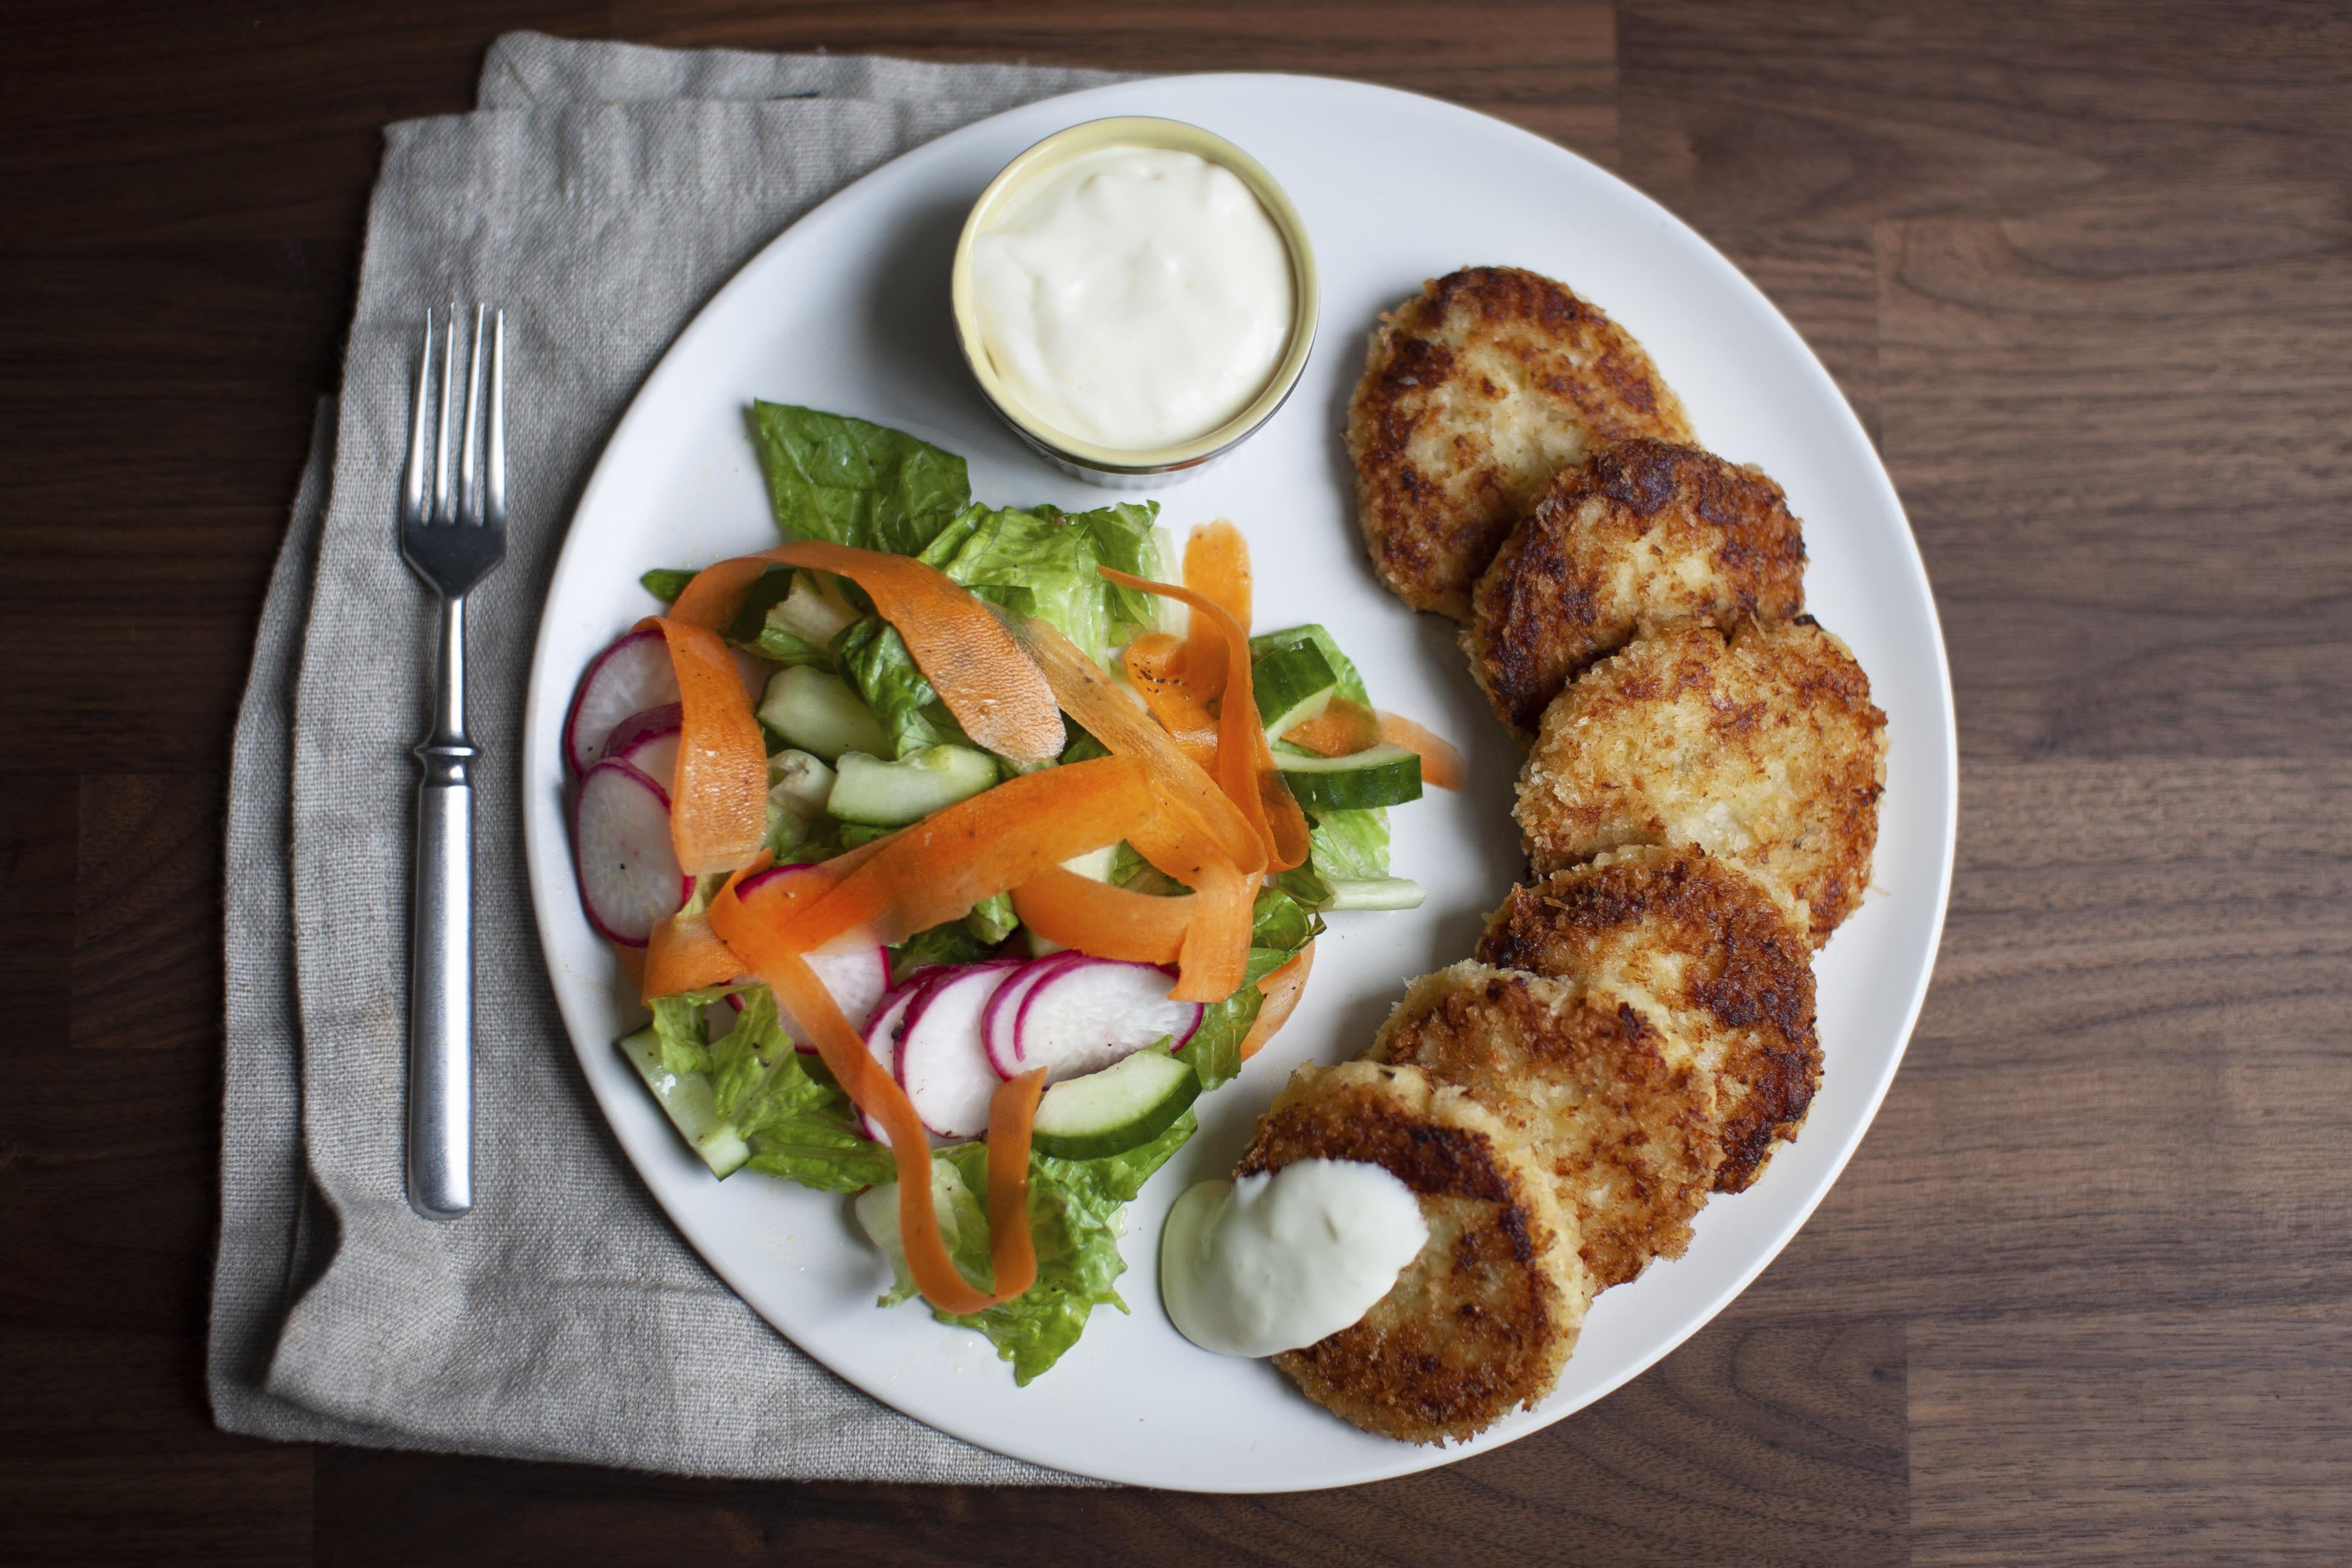 Cod and Potato Cakes with Lemon Mayo and Crunchy Salad